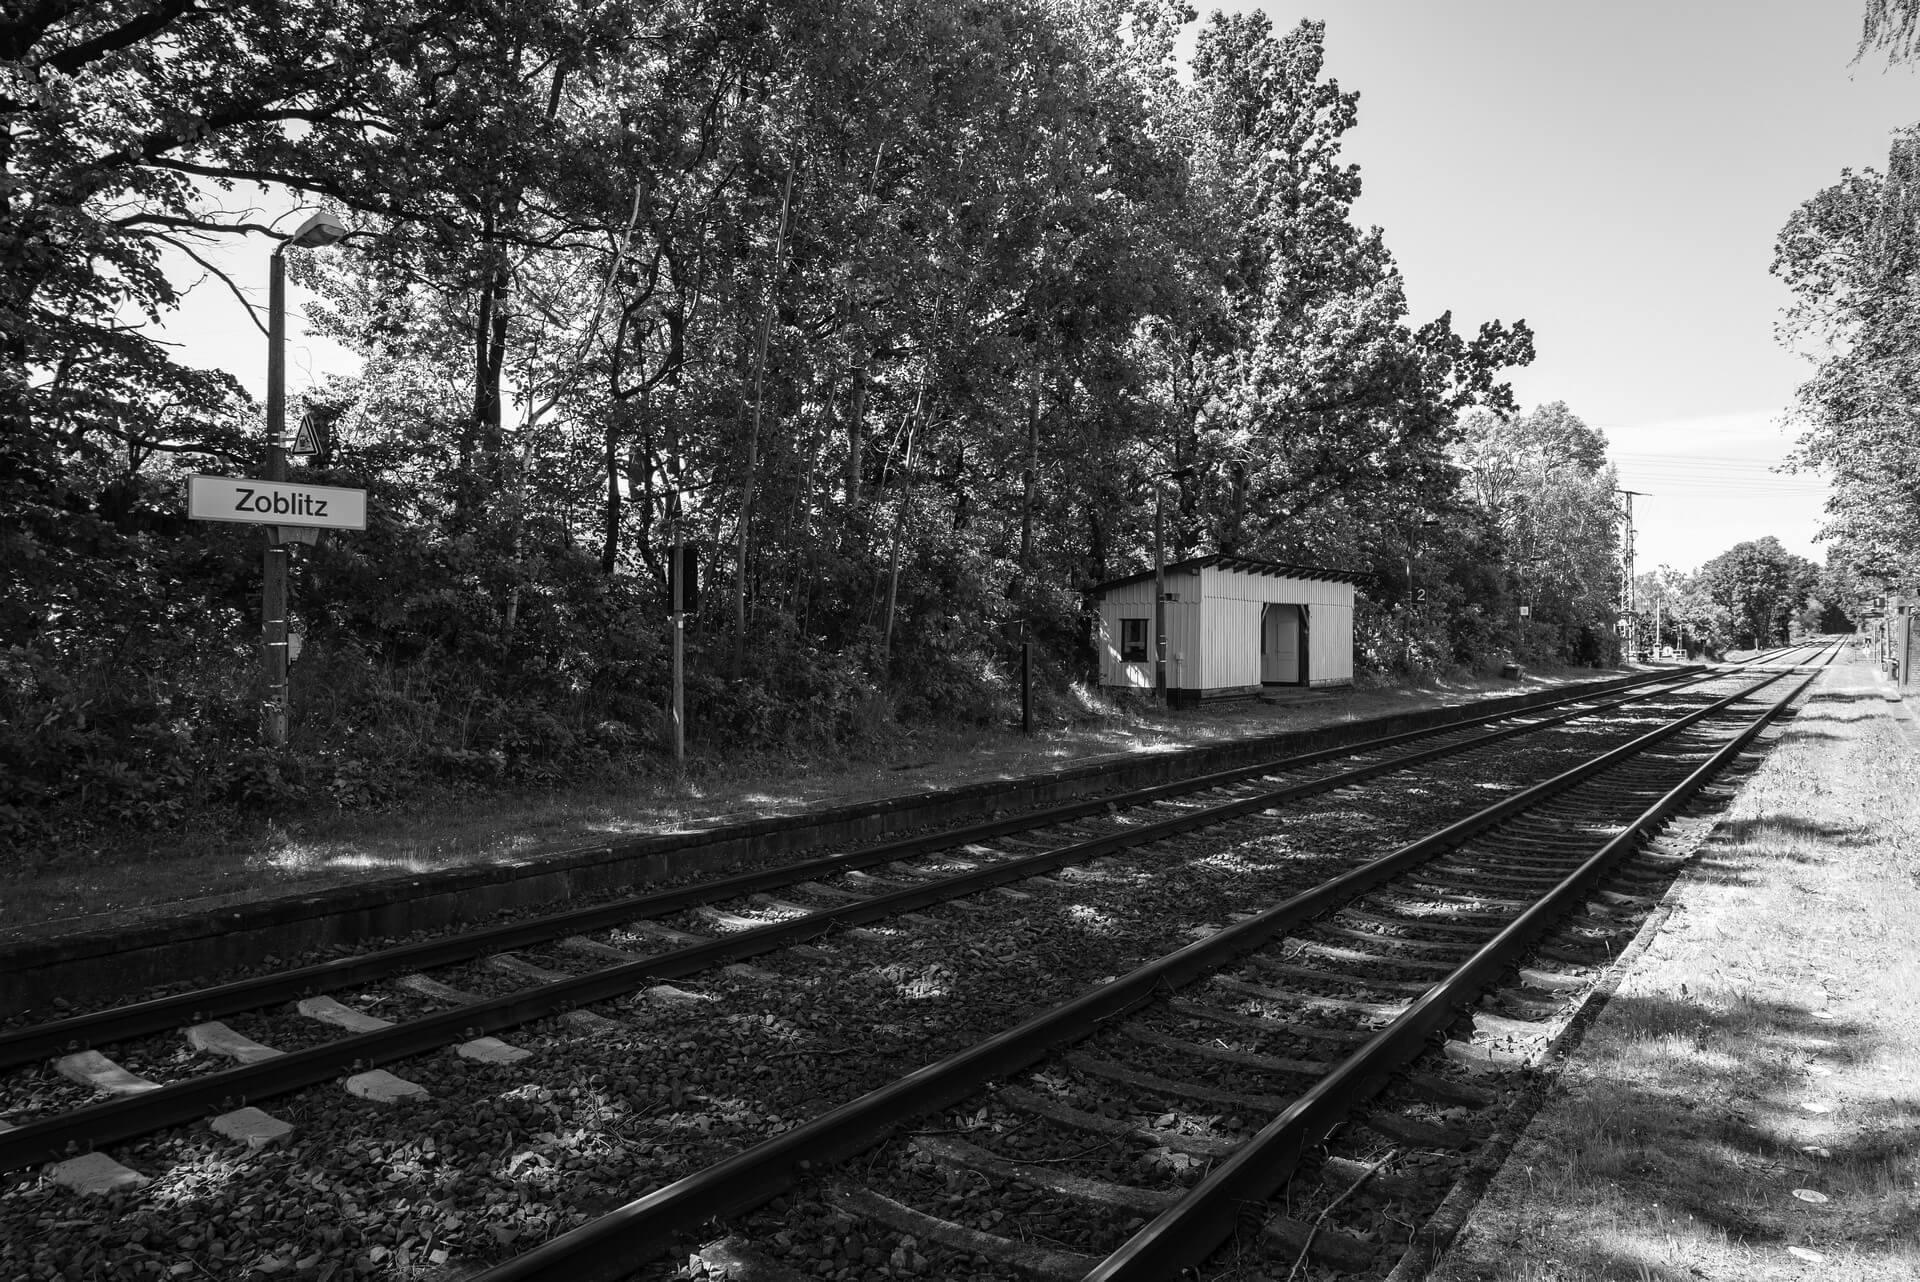 Zoblitz, Bahnhof